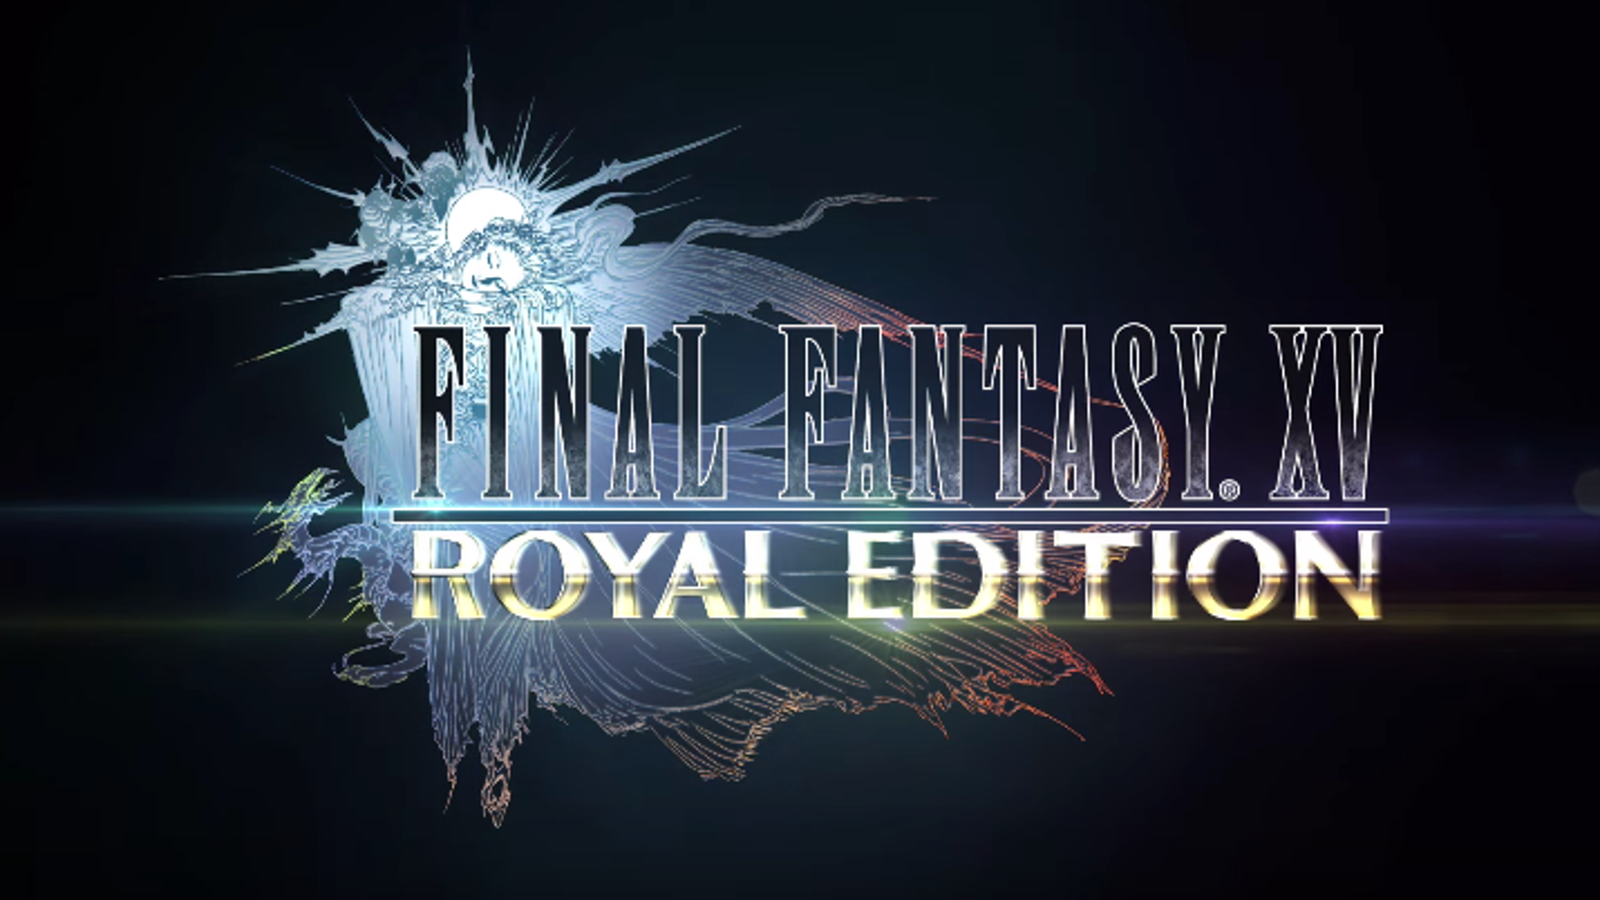 Square Enix Announces Final Fantasy XV: Royal Edition for